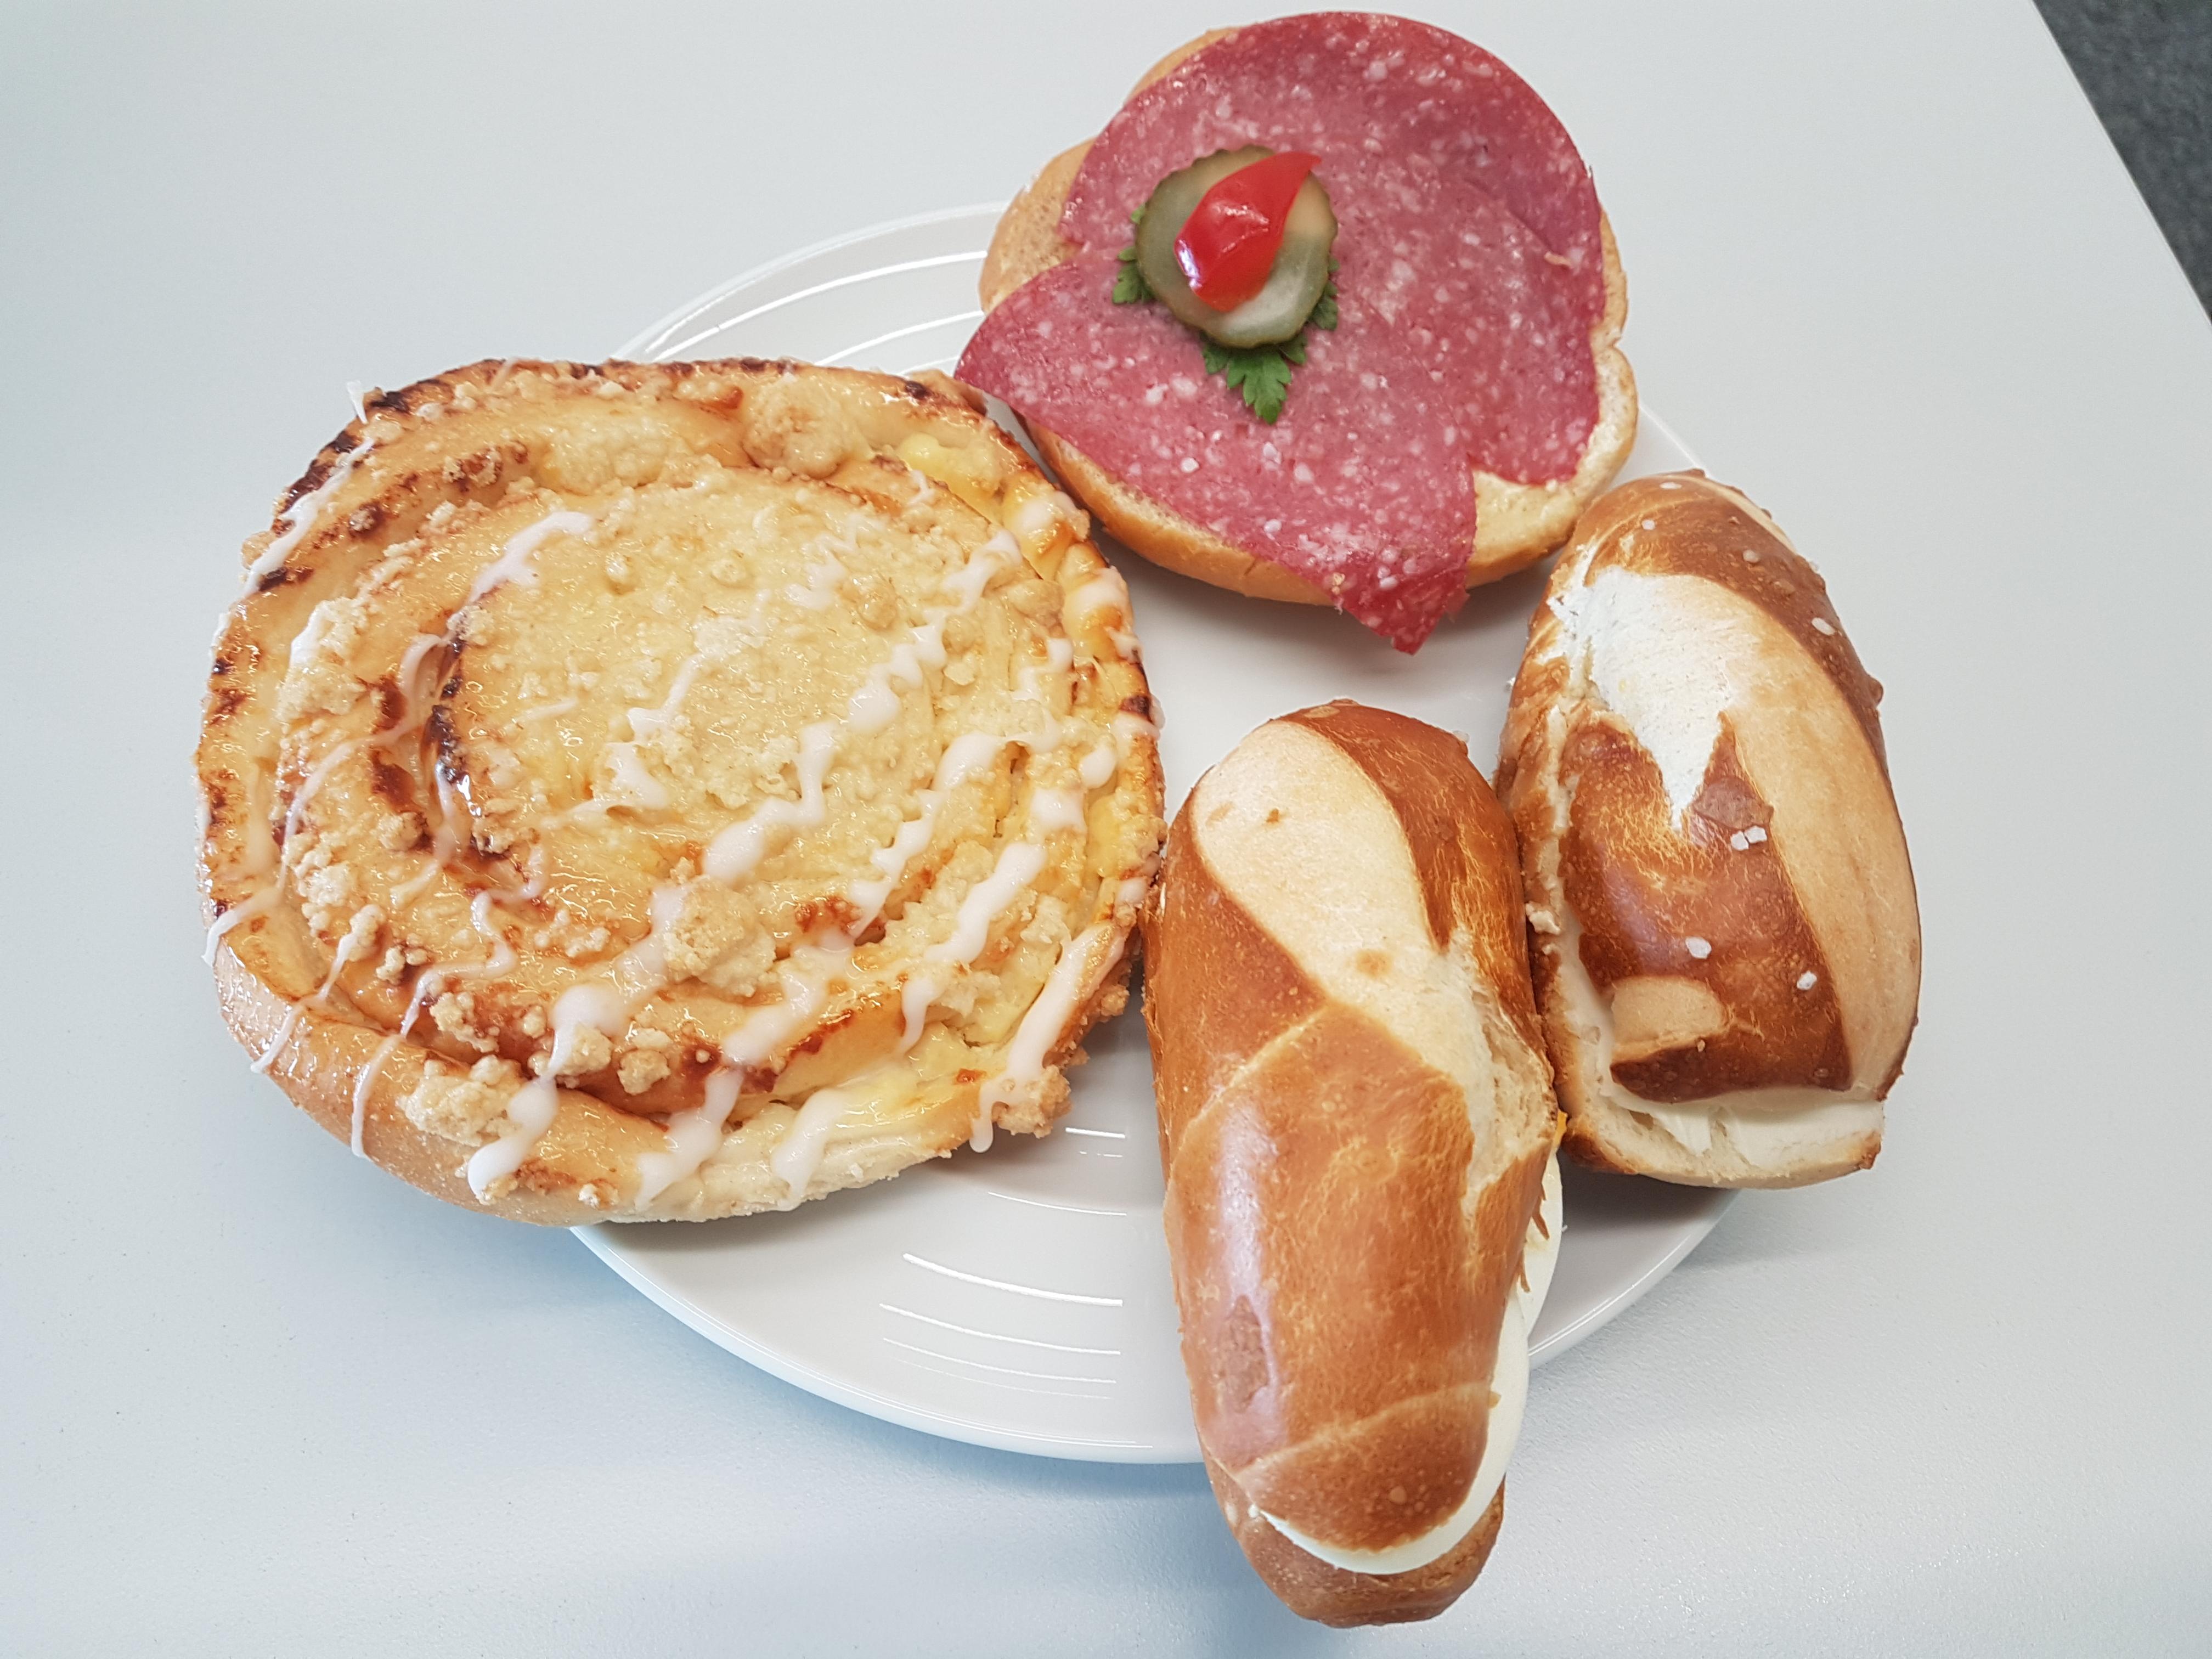 http://foodloader.net/Holz_2018-09-20_Snacks.jpg